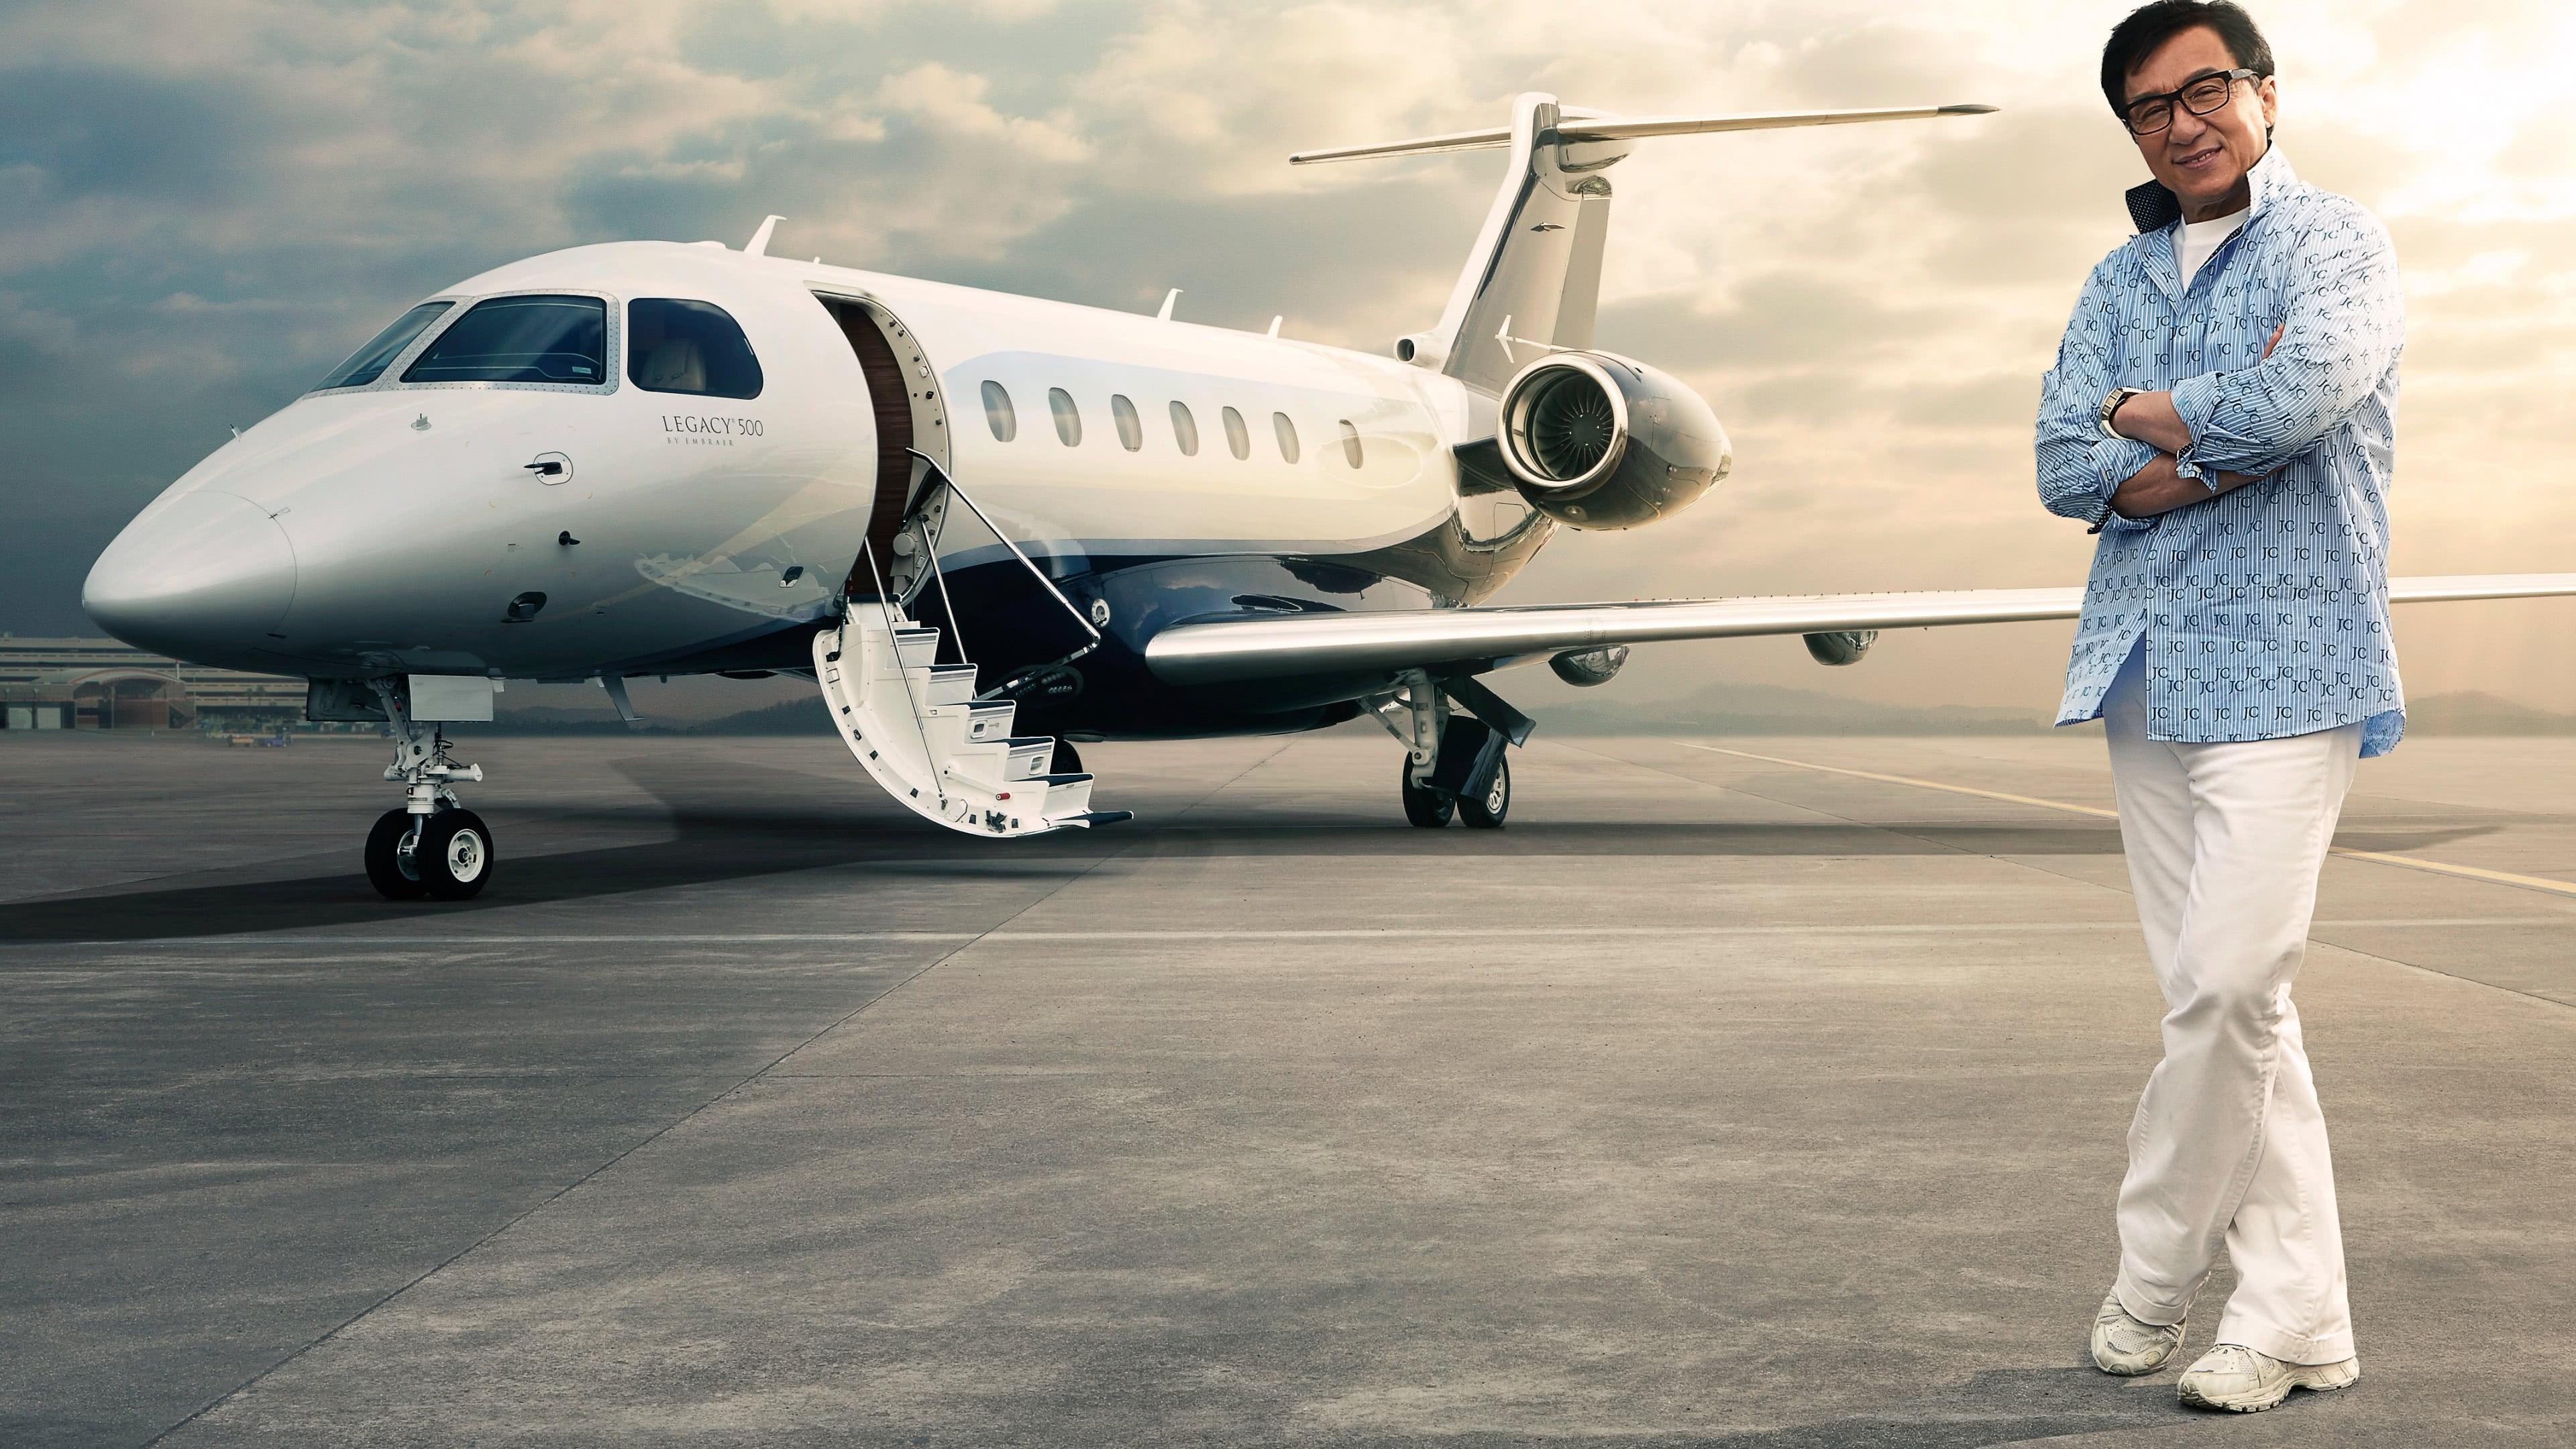 jackie chan embraer legacy 500 private jet uhd 4k wallpaper